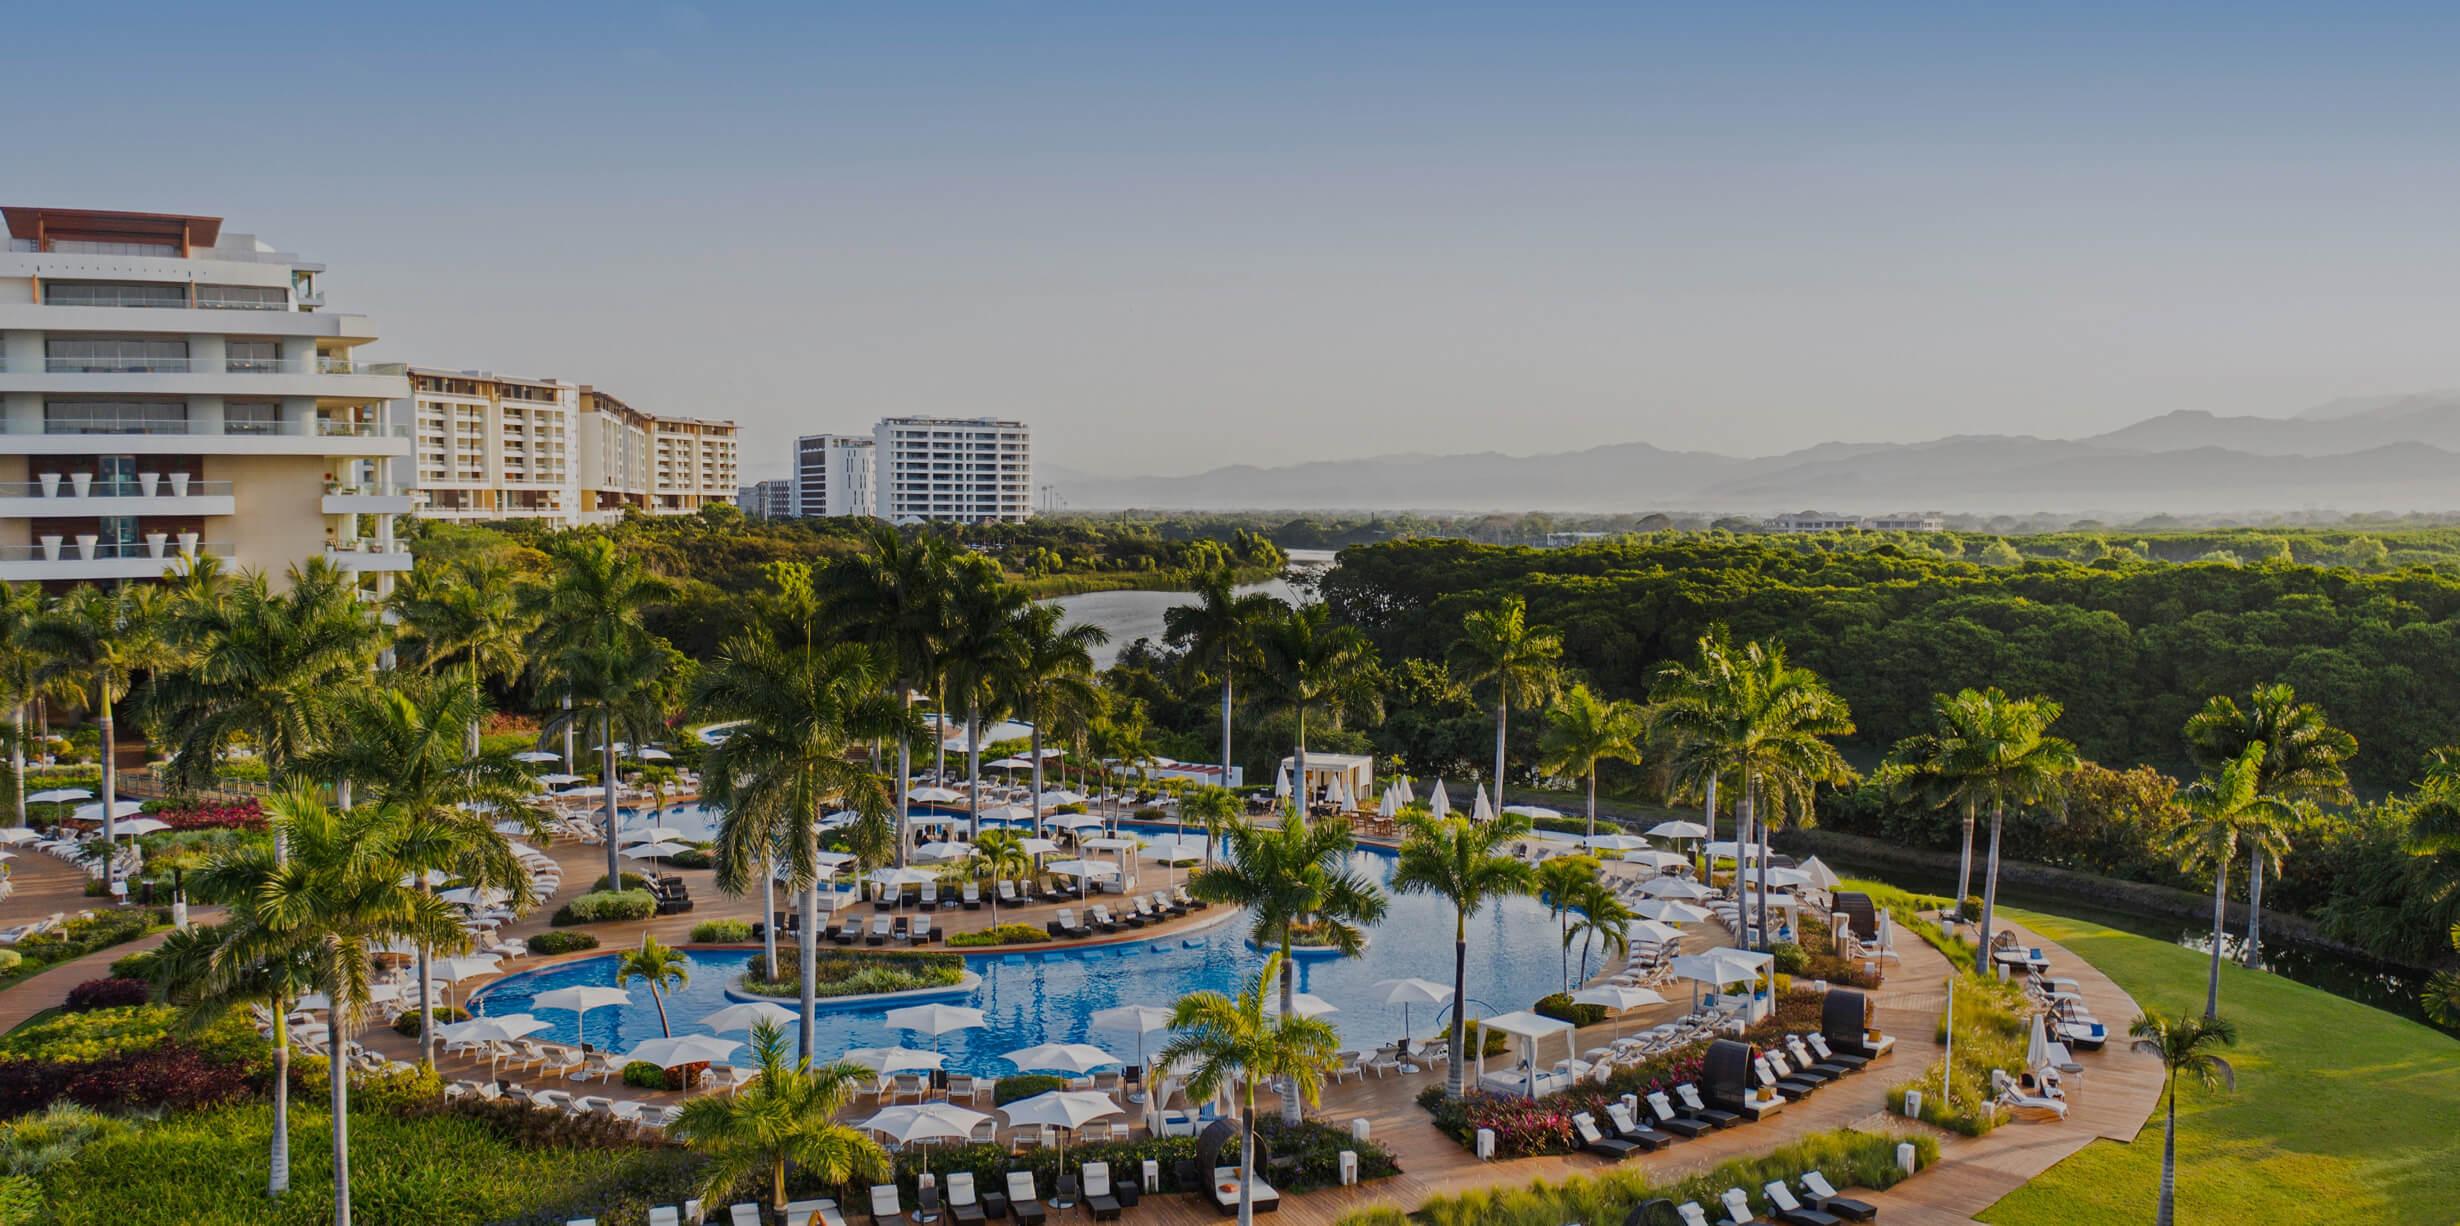 3 Vidanta Destinations Named in Top 500 in the World